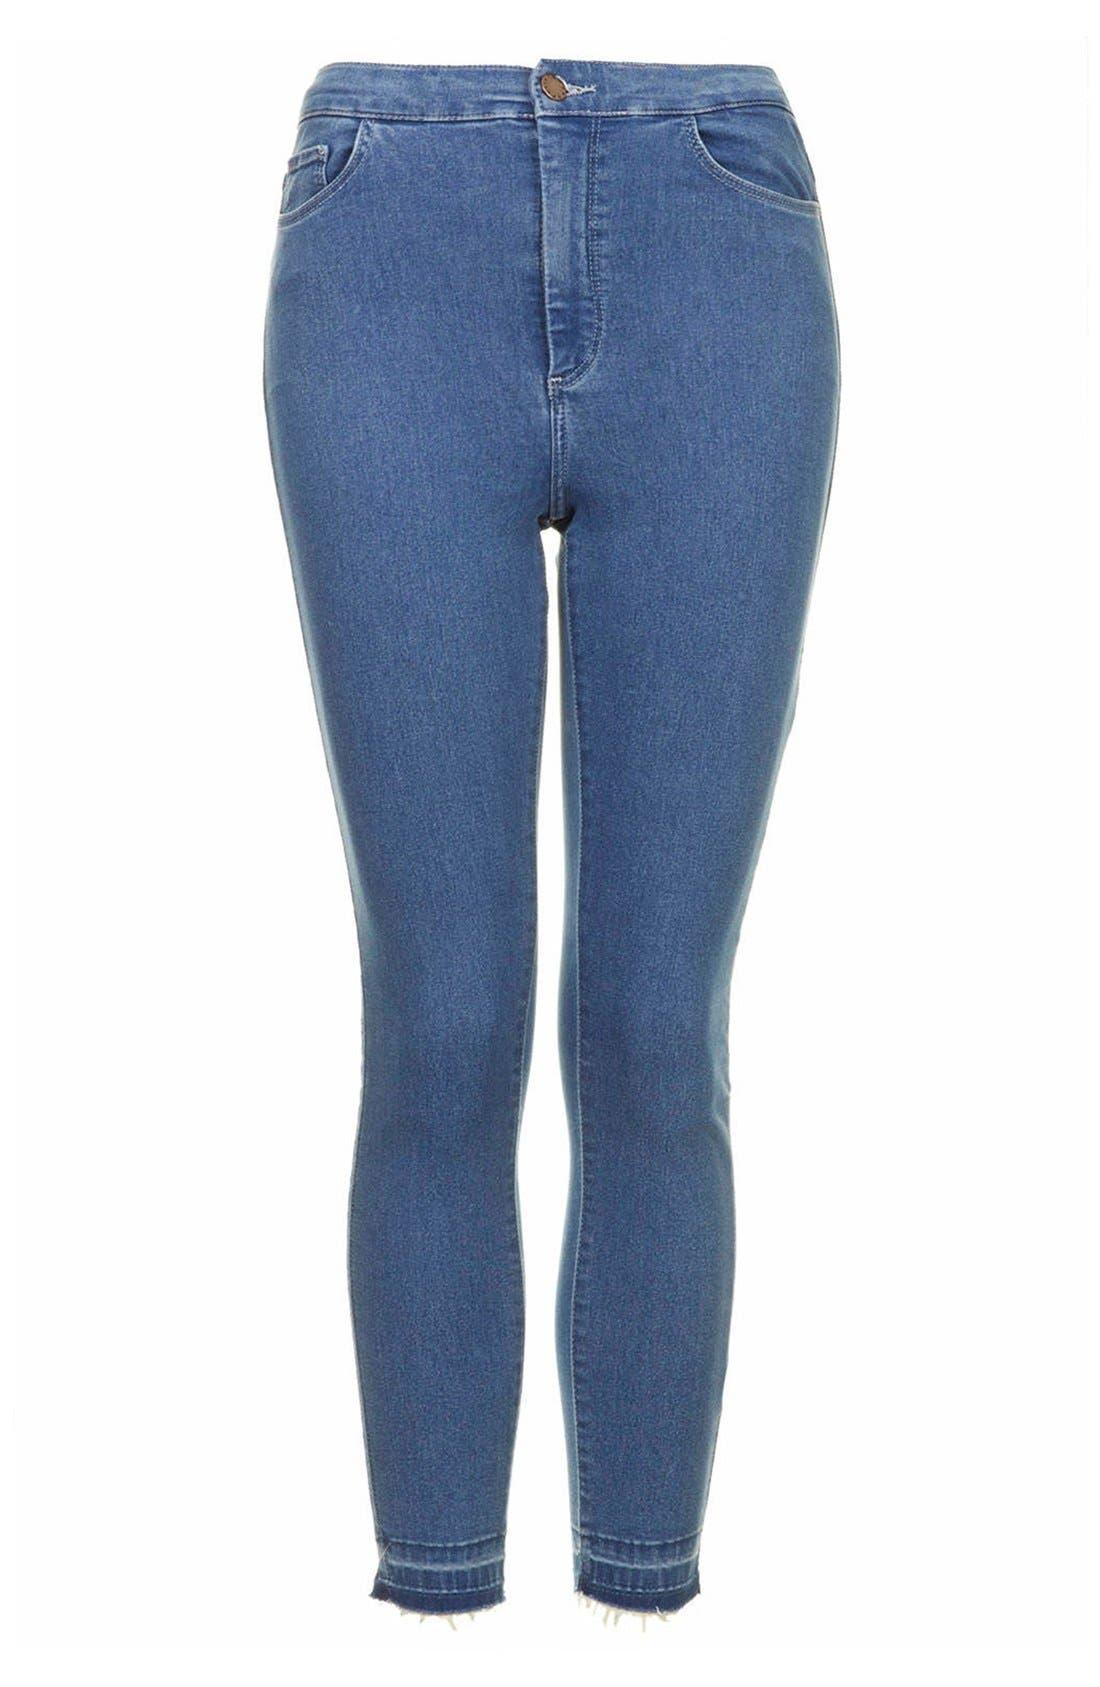 Alternate Image 3  - Topshop Moto 'Joni' High Rise Crop Skinny Jeans (Light)